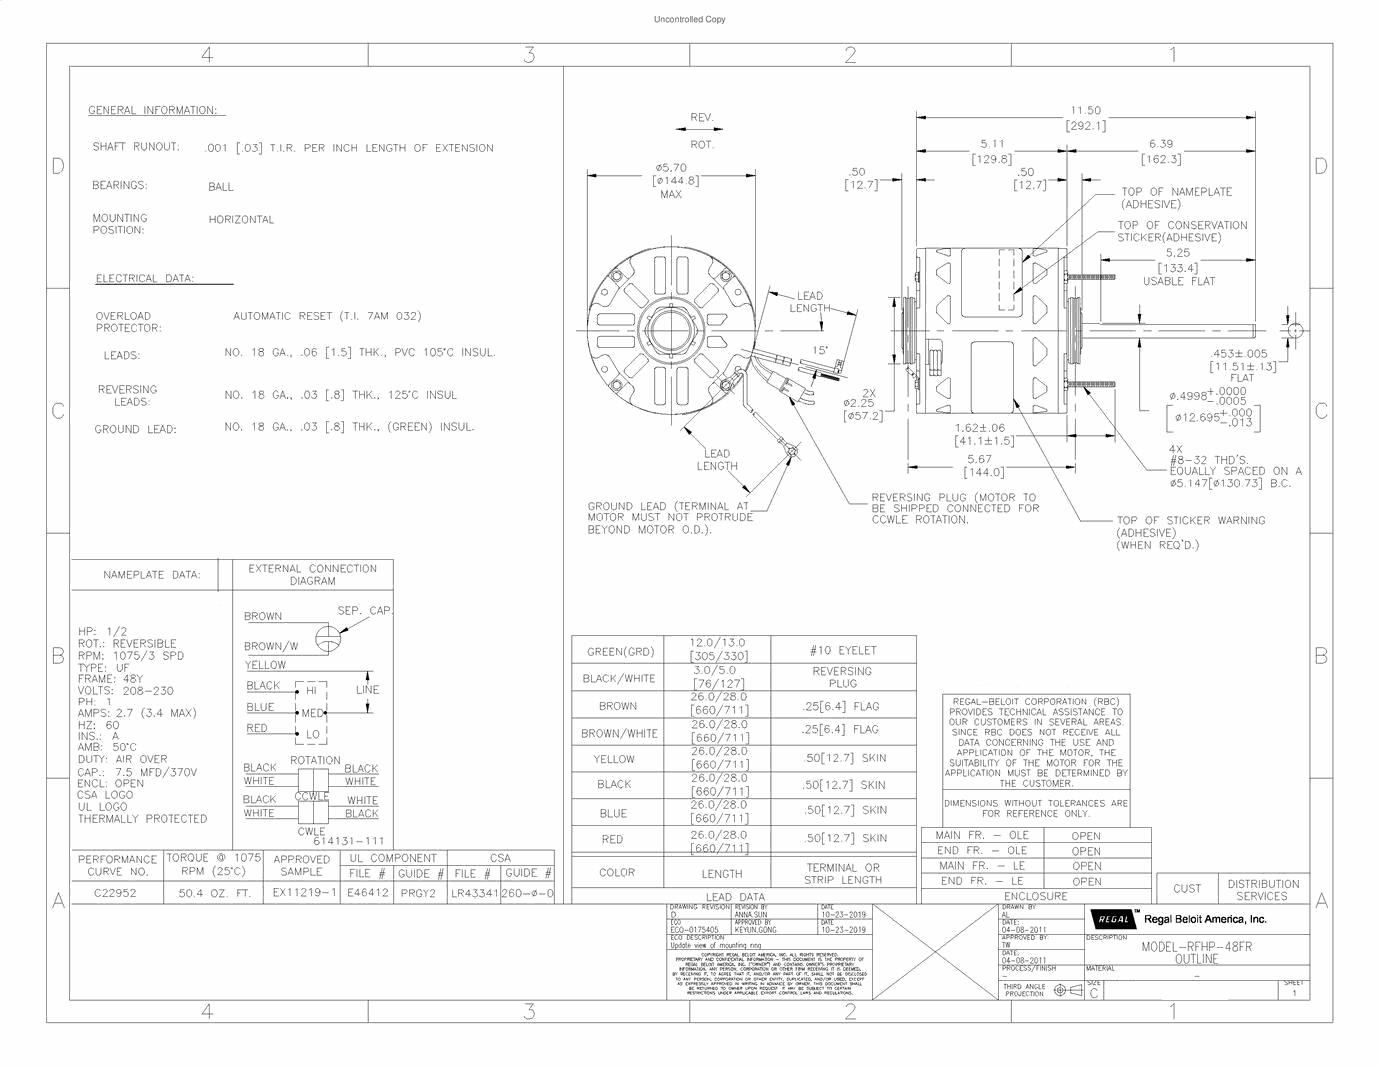 GE_Mars, 5KCP39LGG451S, Electric Motor